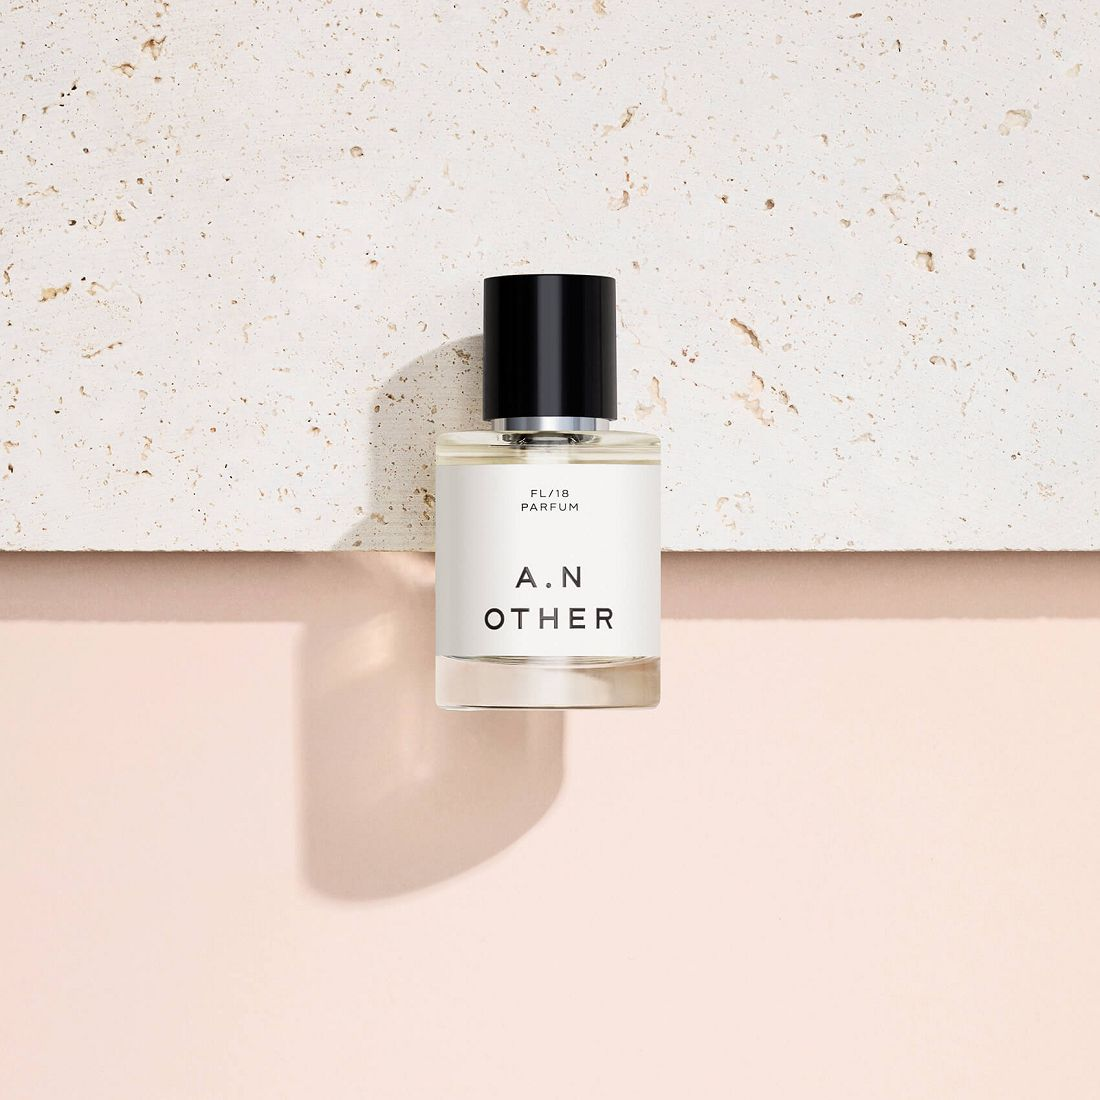 A. N. OTHER 吸磁式香水 FL / 18 50ml